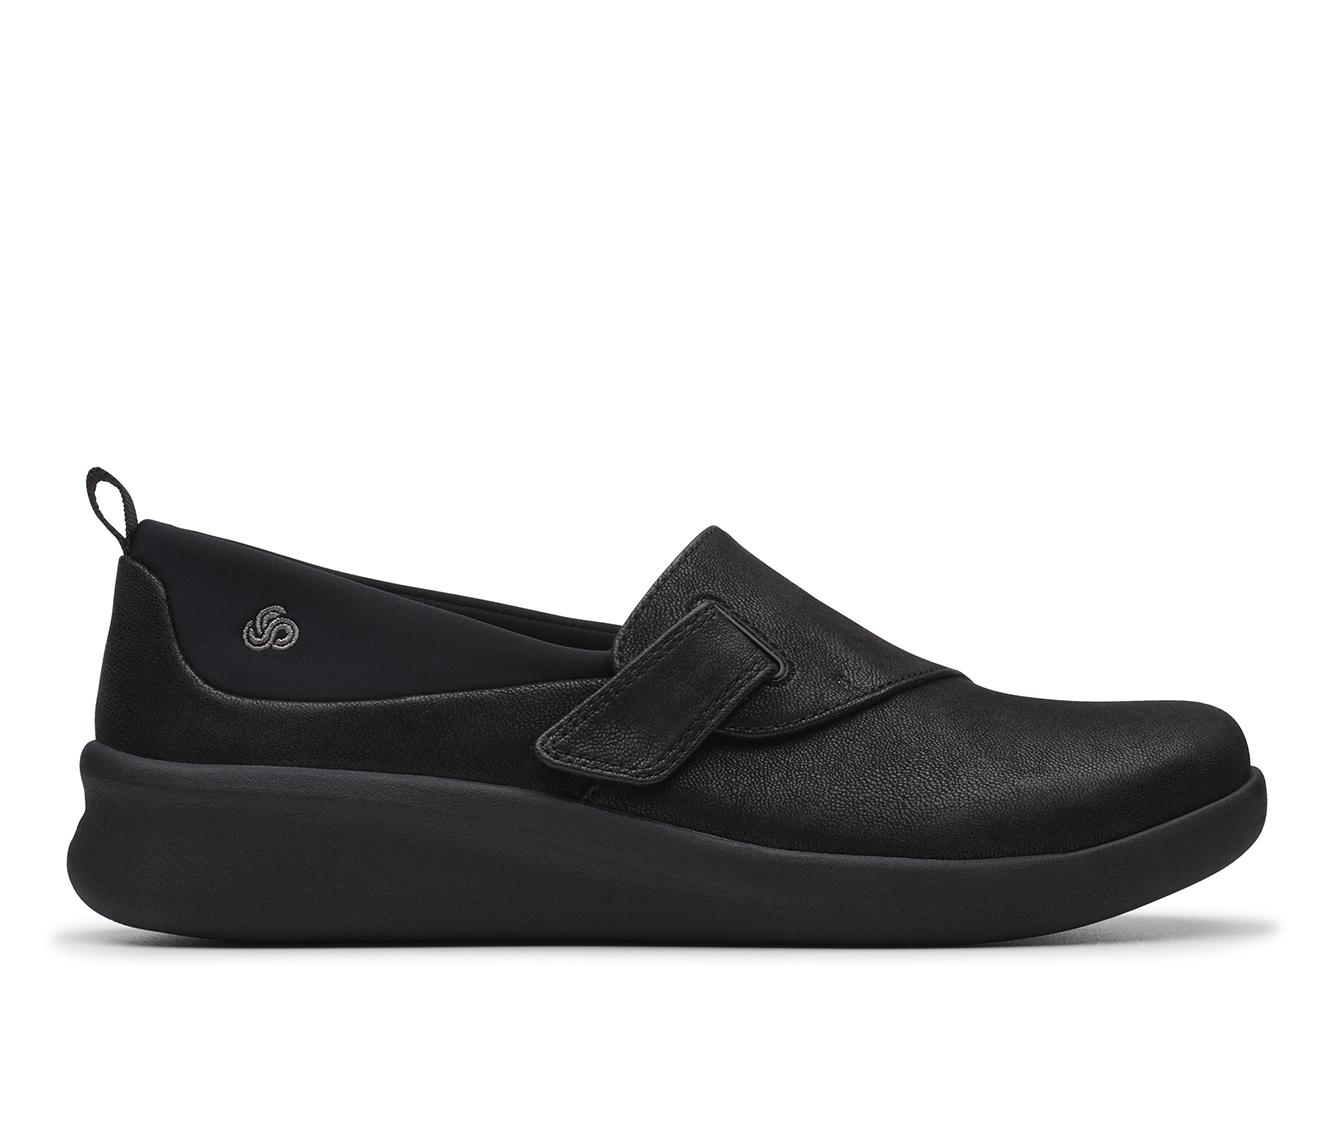 Clarks Sillian 2.0 Ease Women's Shoe (Black Canvas)